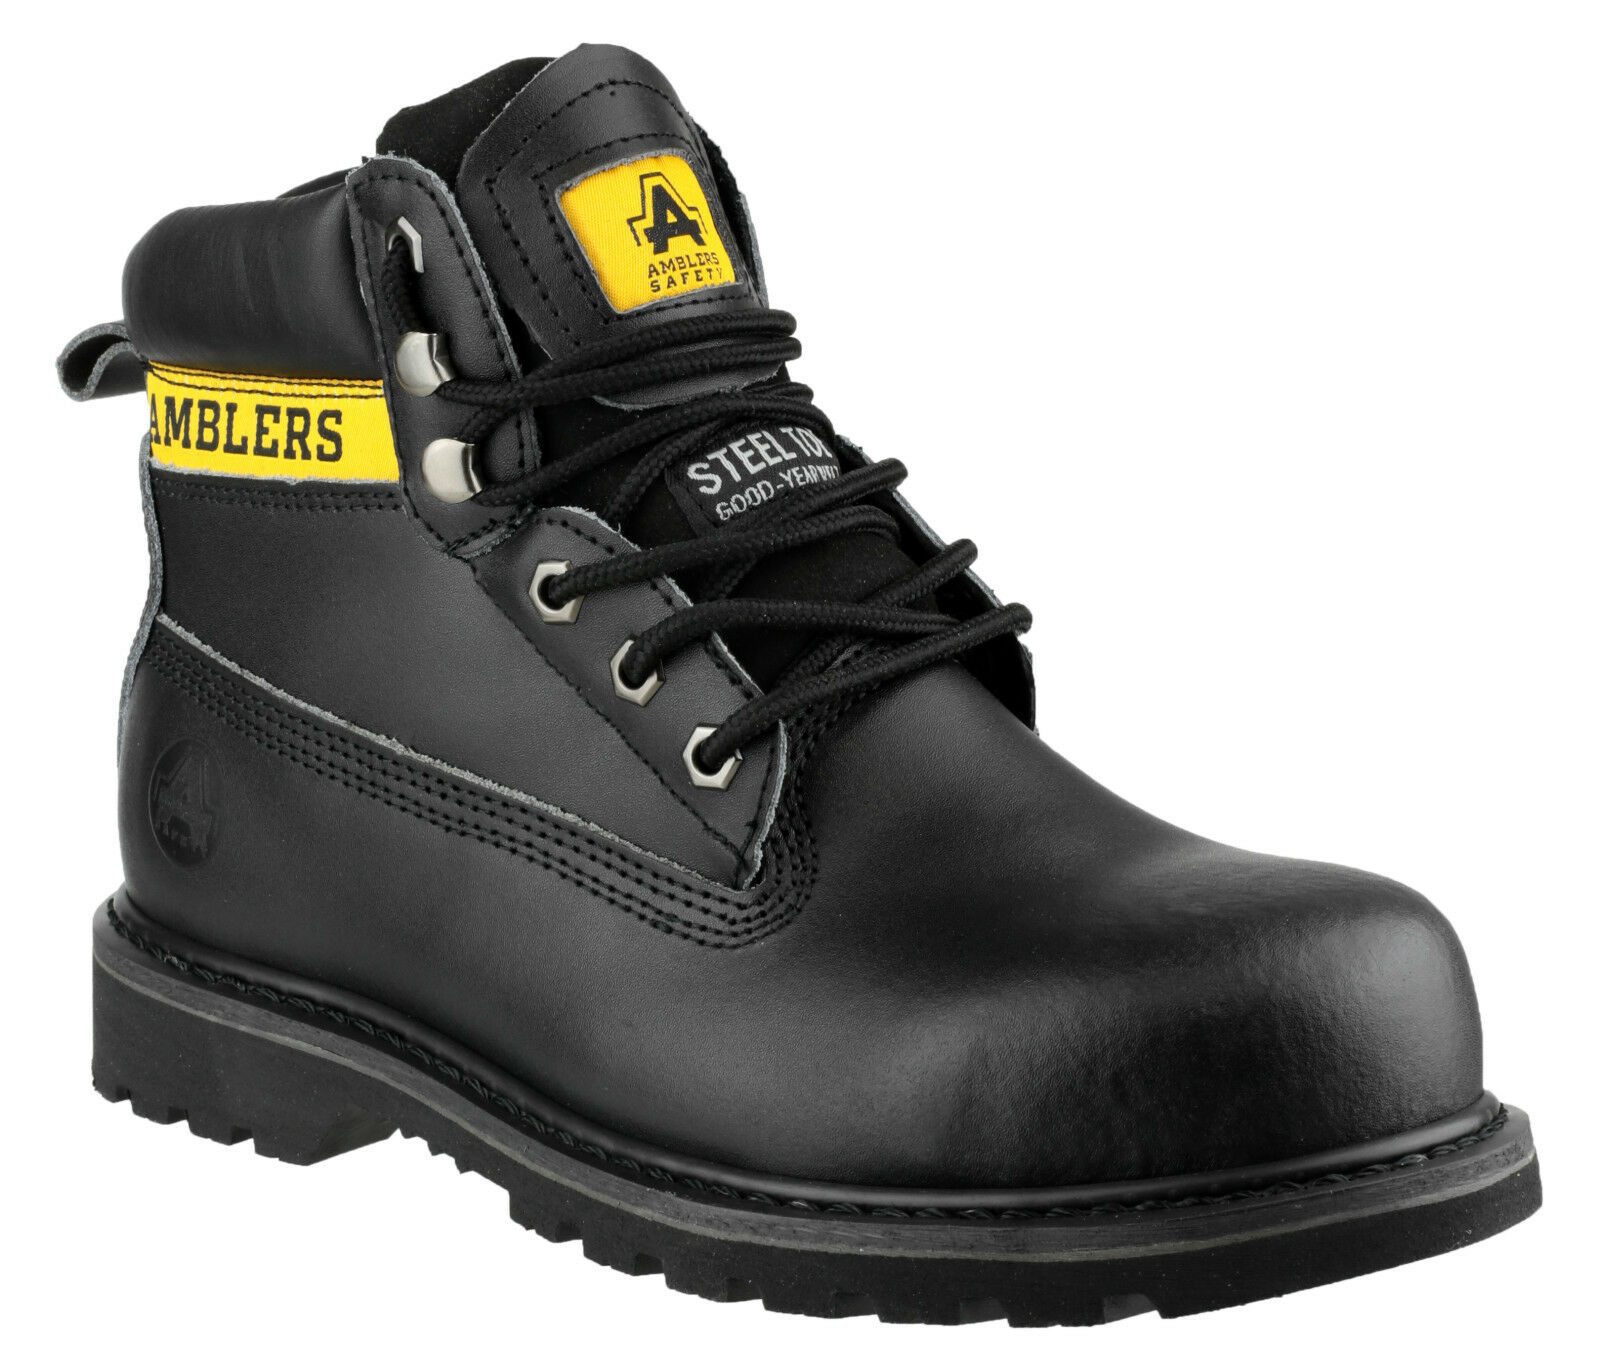 Amblers FS100 Safety Waterproof Mens Boys Unisex Work Wellington Boots UK4-13